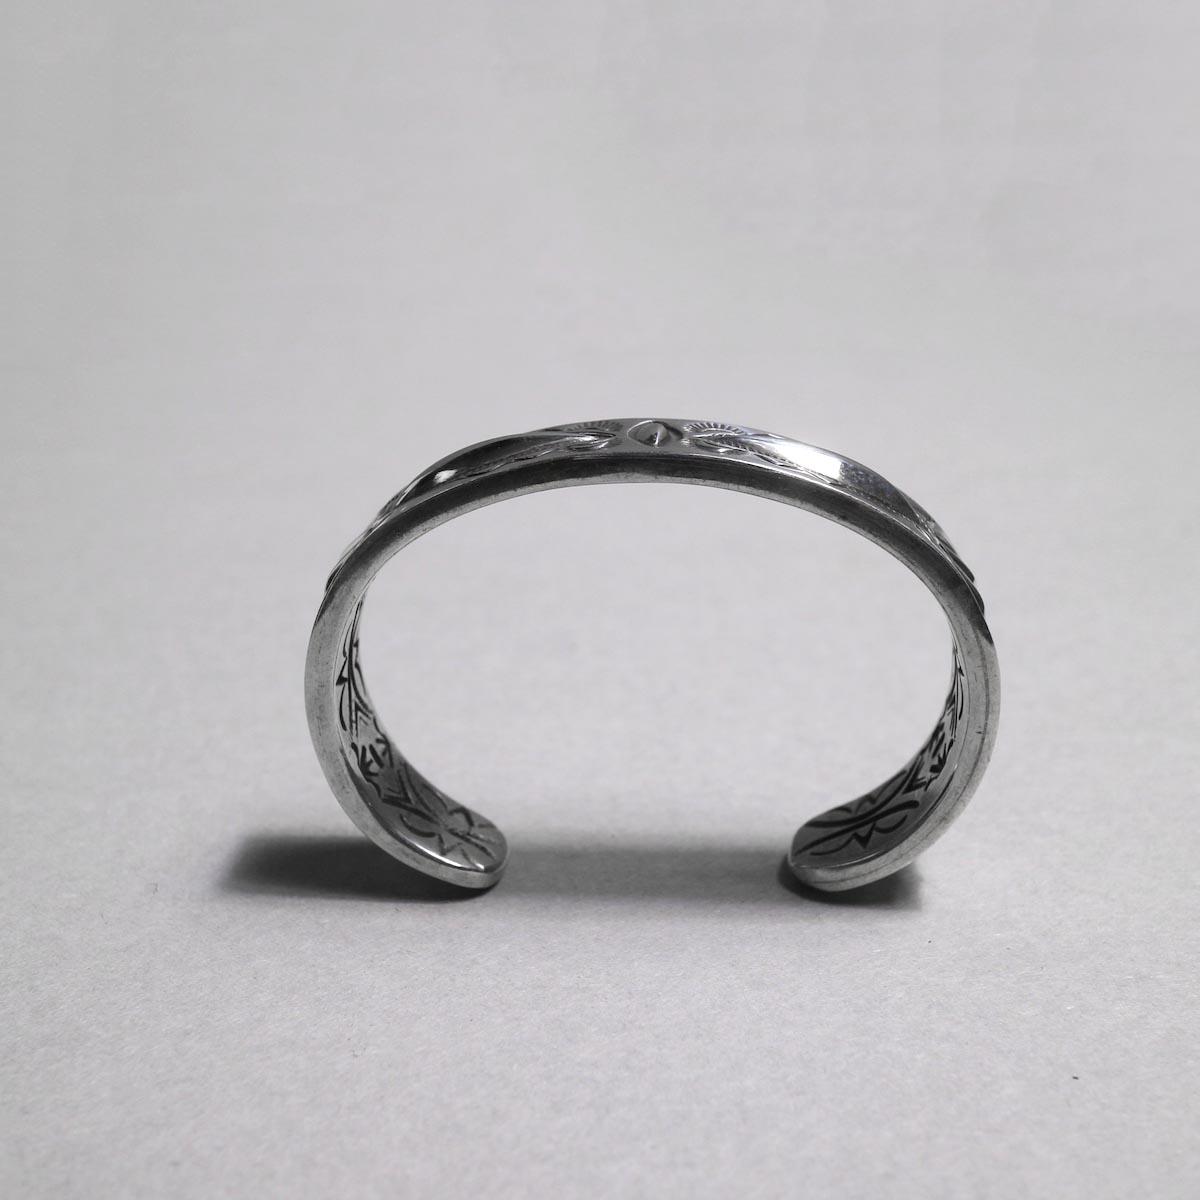 RAY ADAKAI / Double Stamp Bracelet (C) 全体